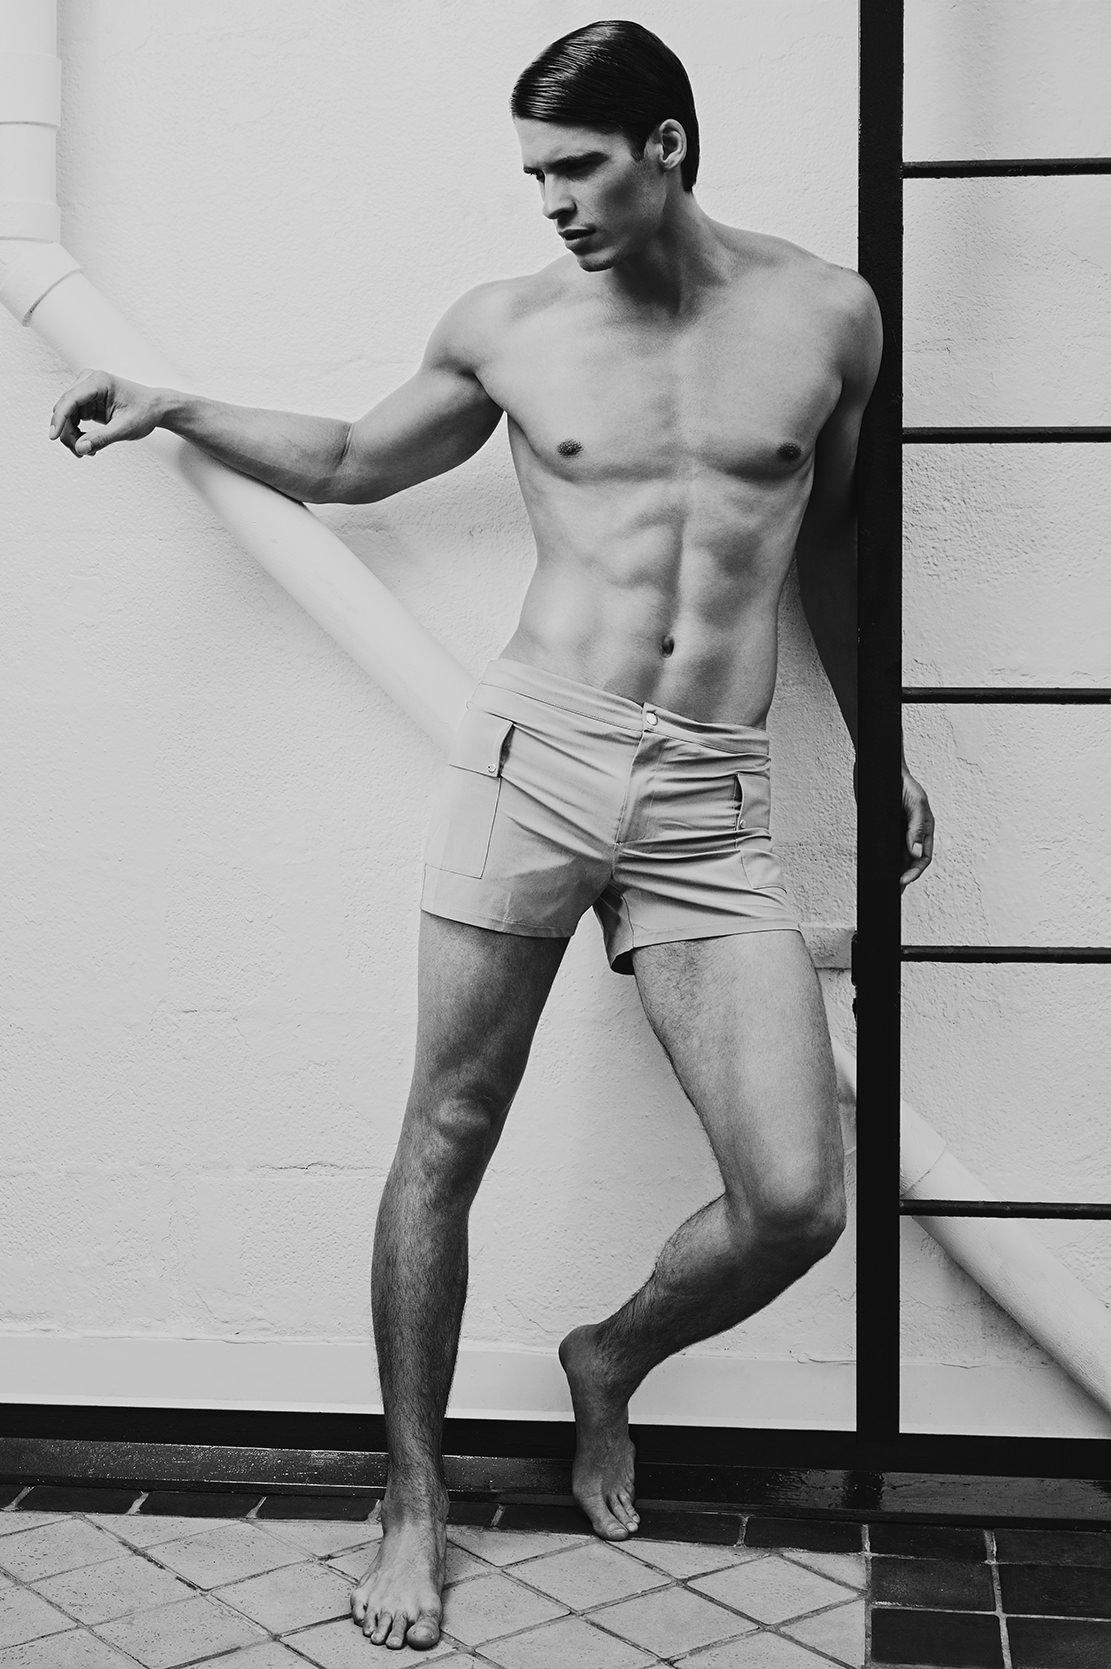 LouisPhilip-foliomodels-by-the-pool-in-swimwear.jpg